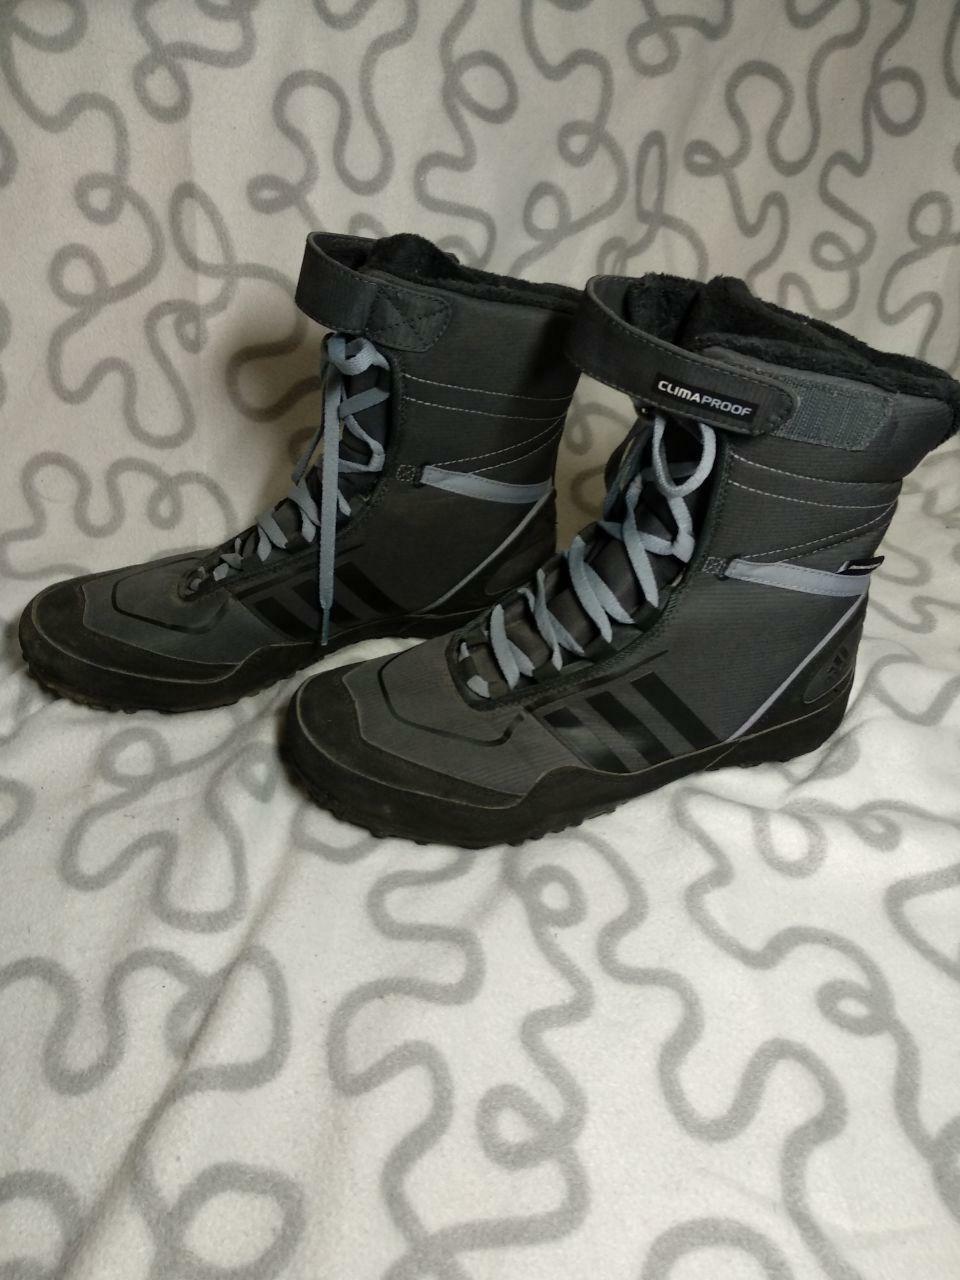 Adidas Mujer gris Primaloft Climaproof botas TALLA